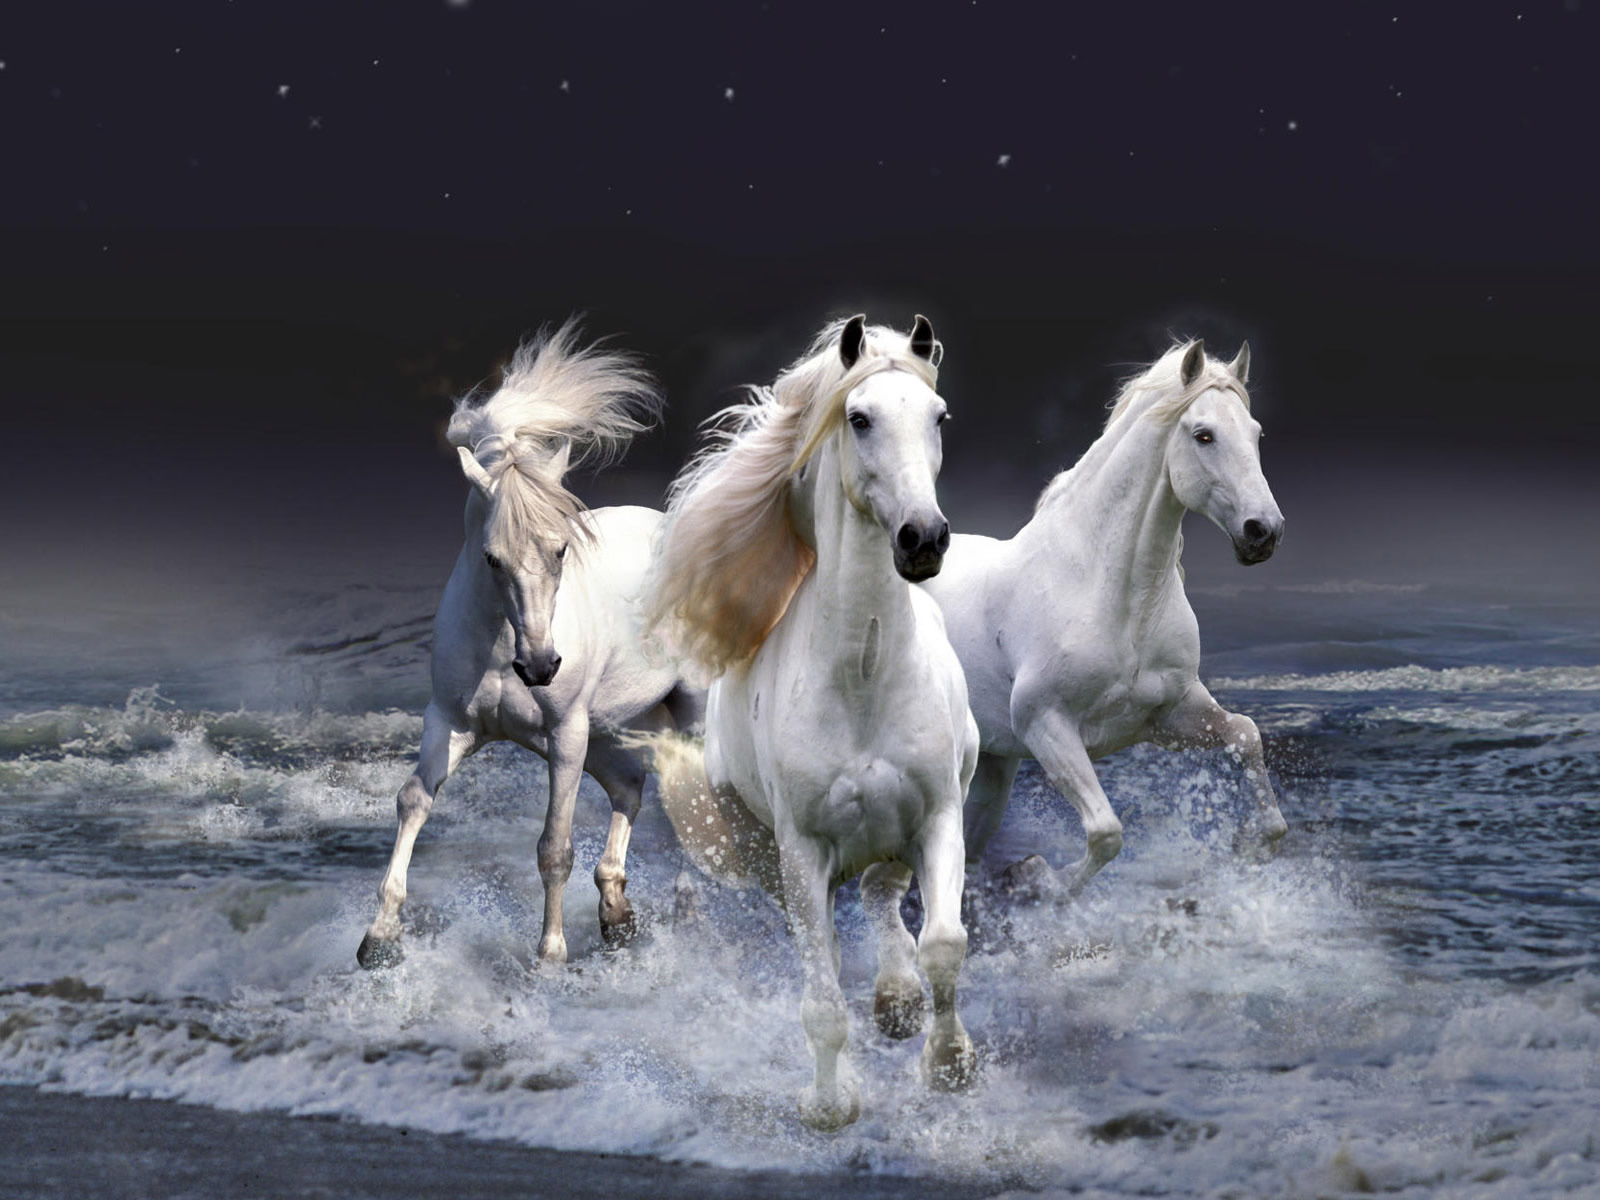 horse wallpaper arabian horse wallpaper beautiful horse wallpaper 1600x1200